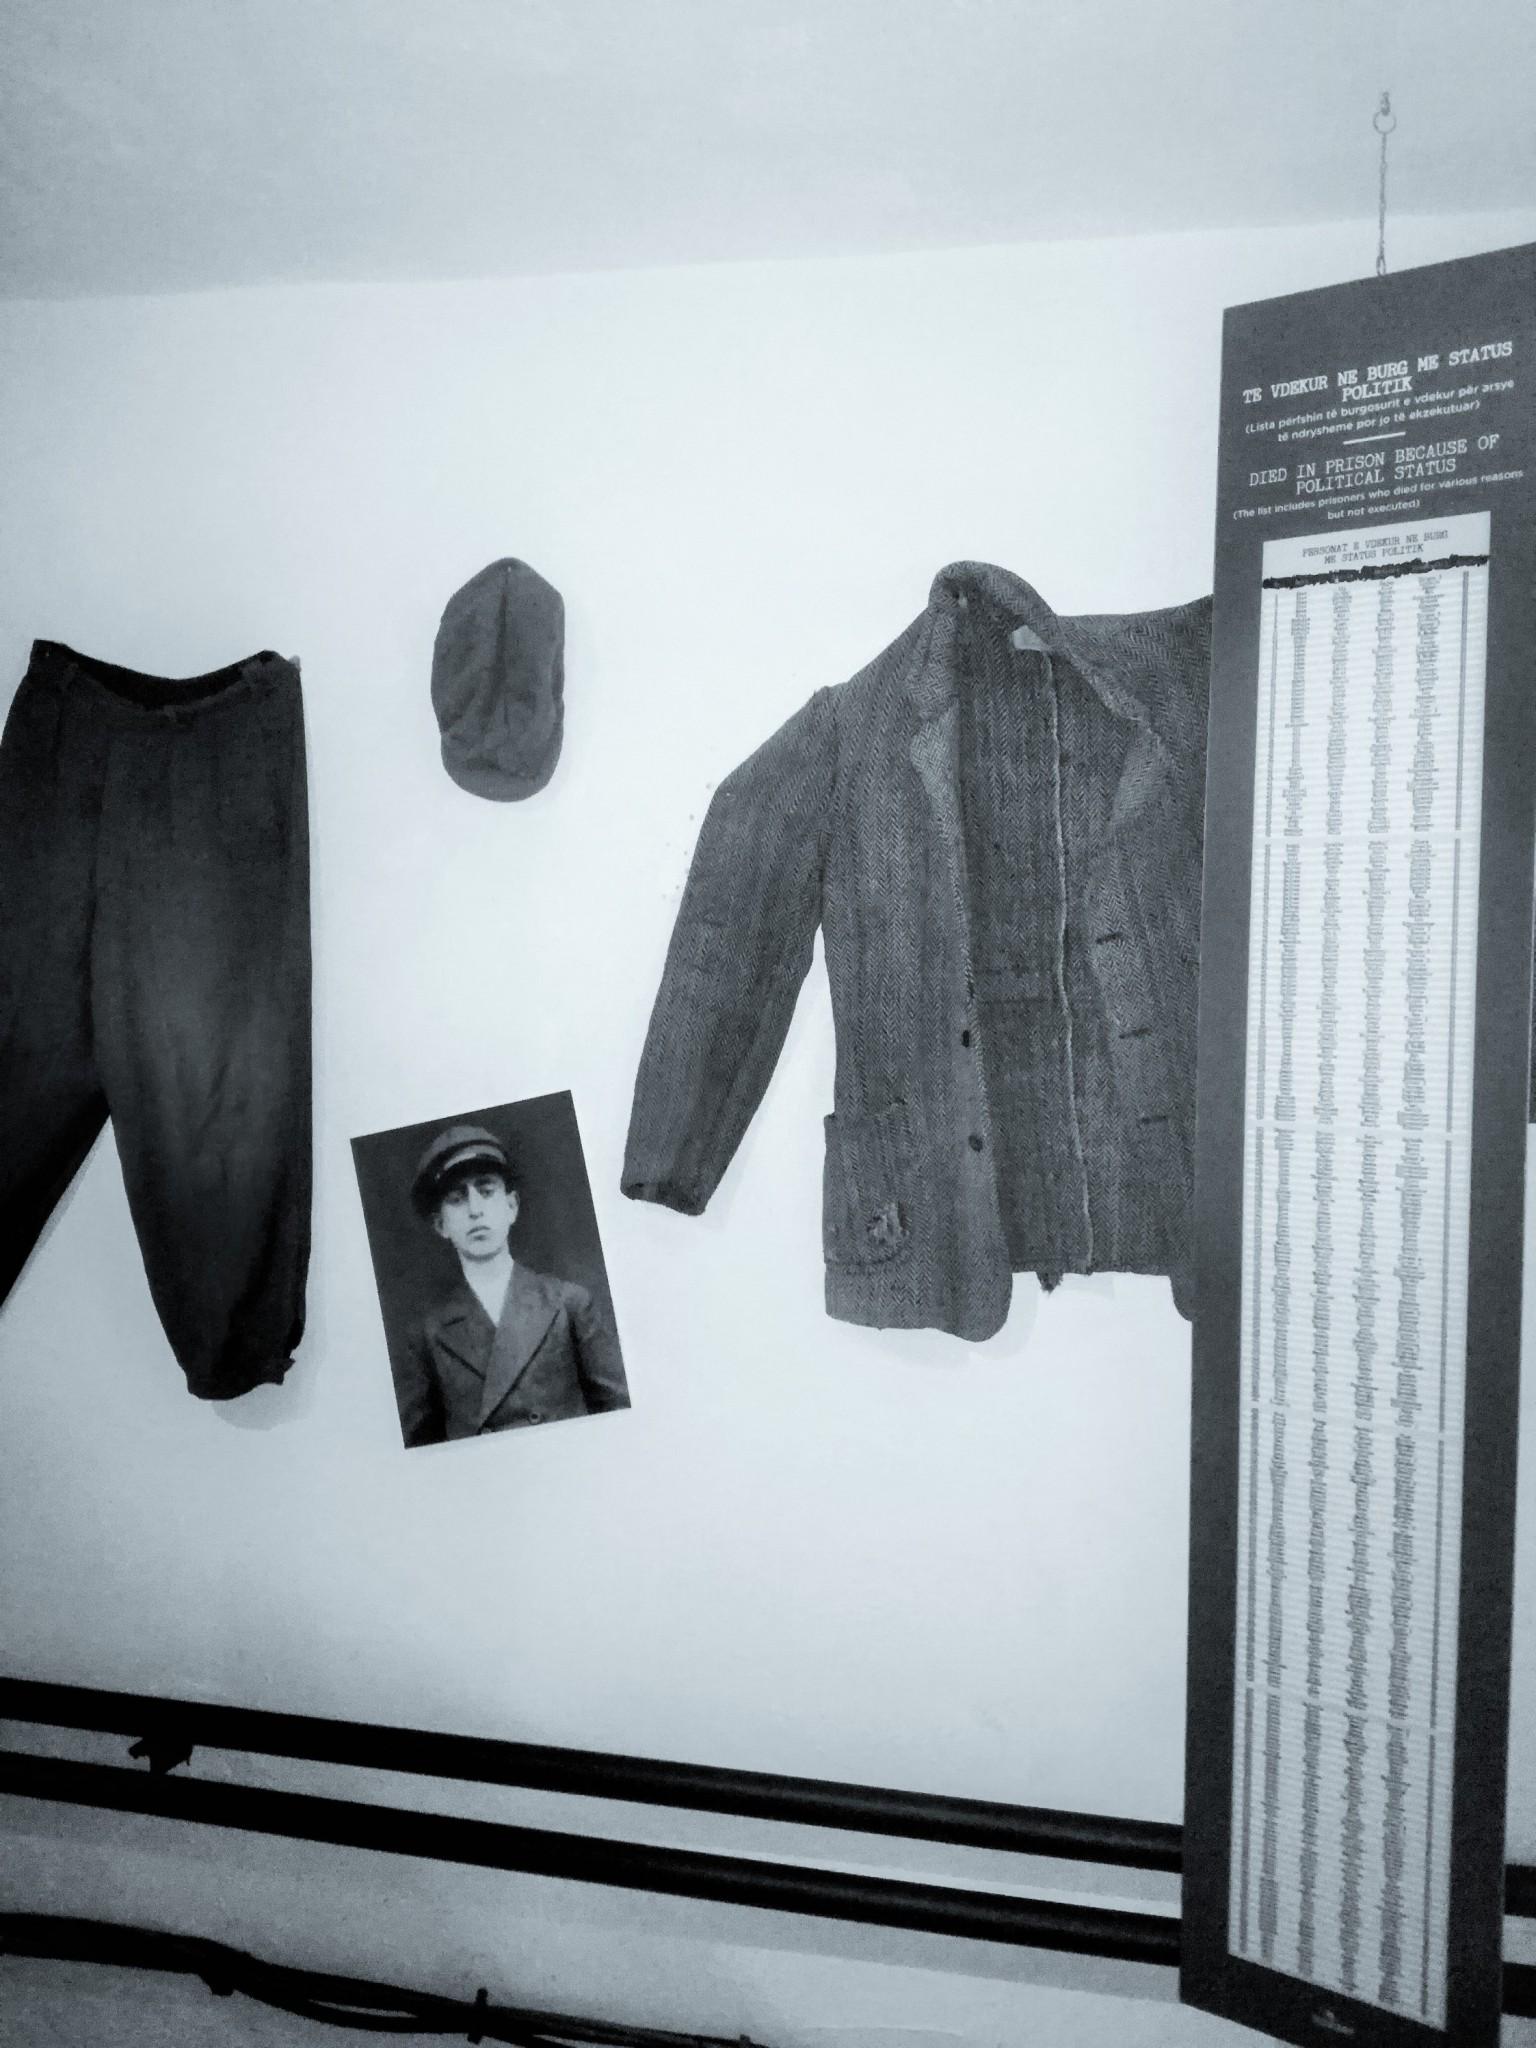 indumenti dei prigionieri